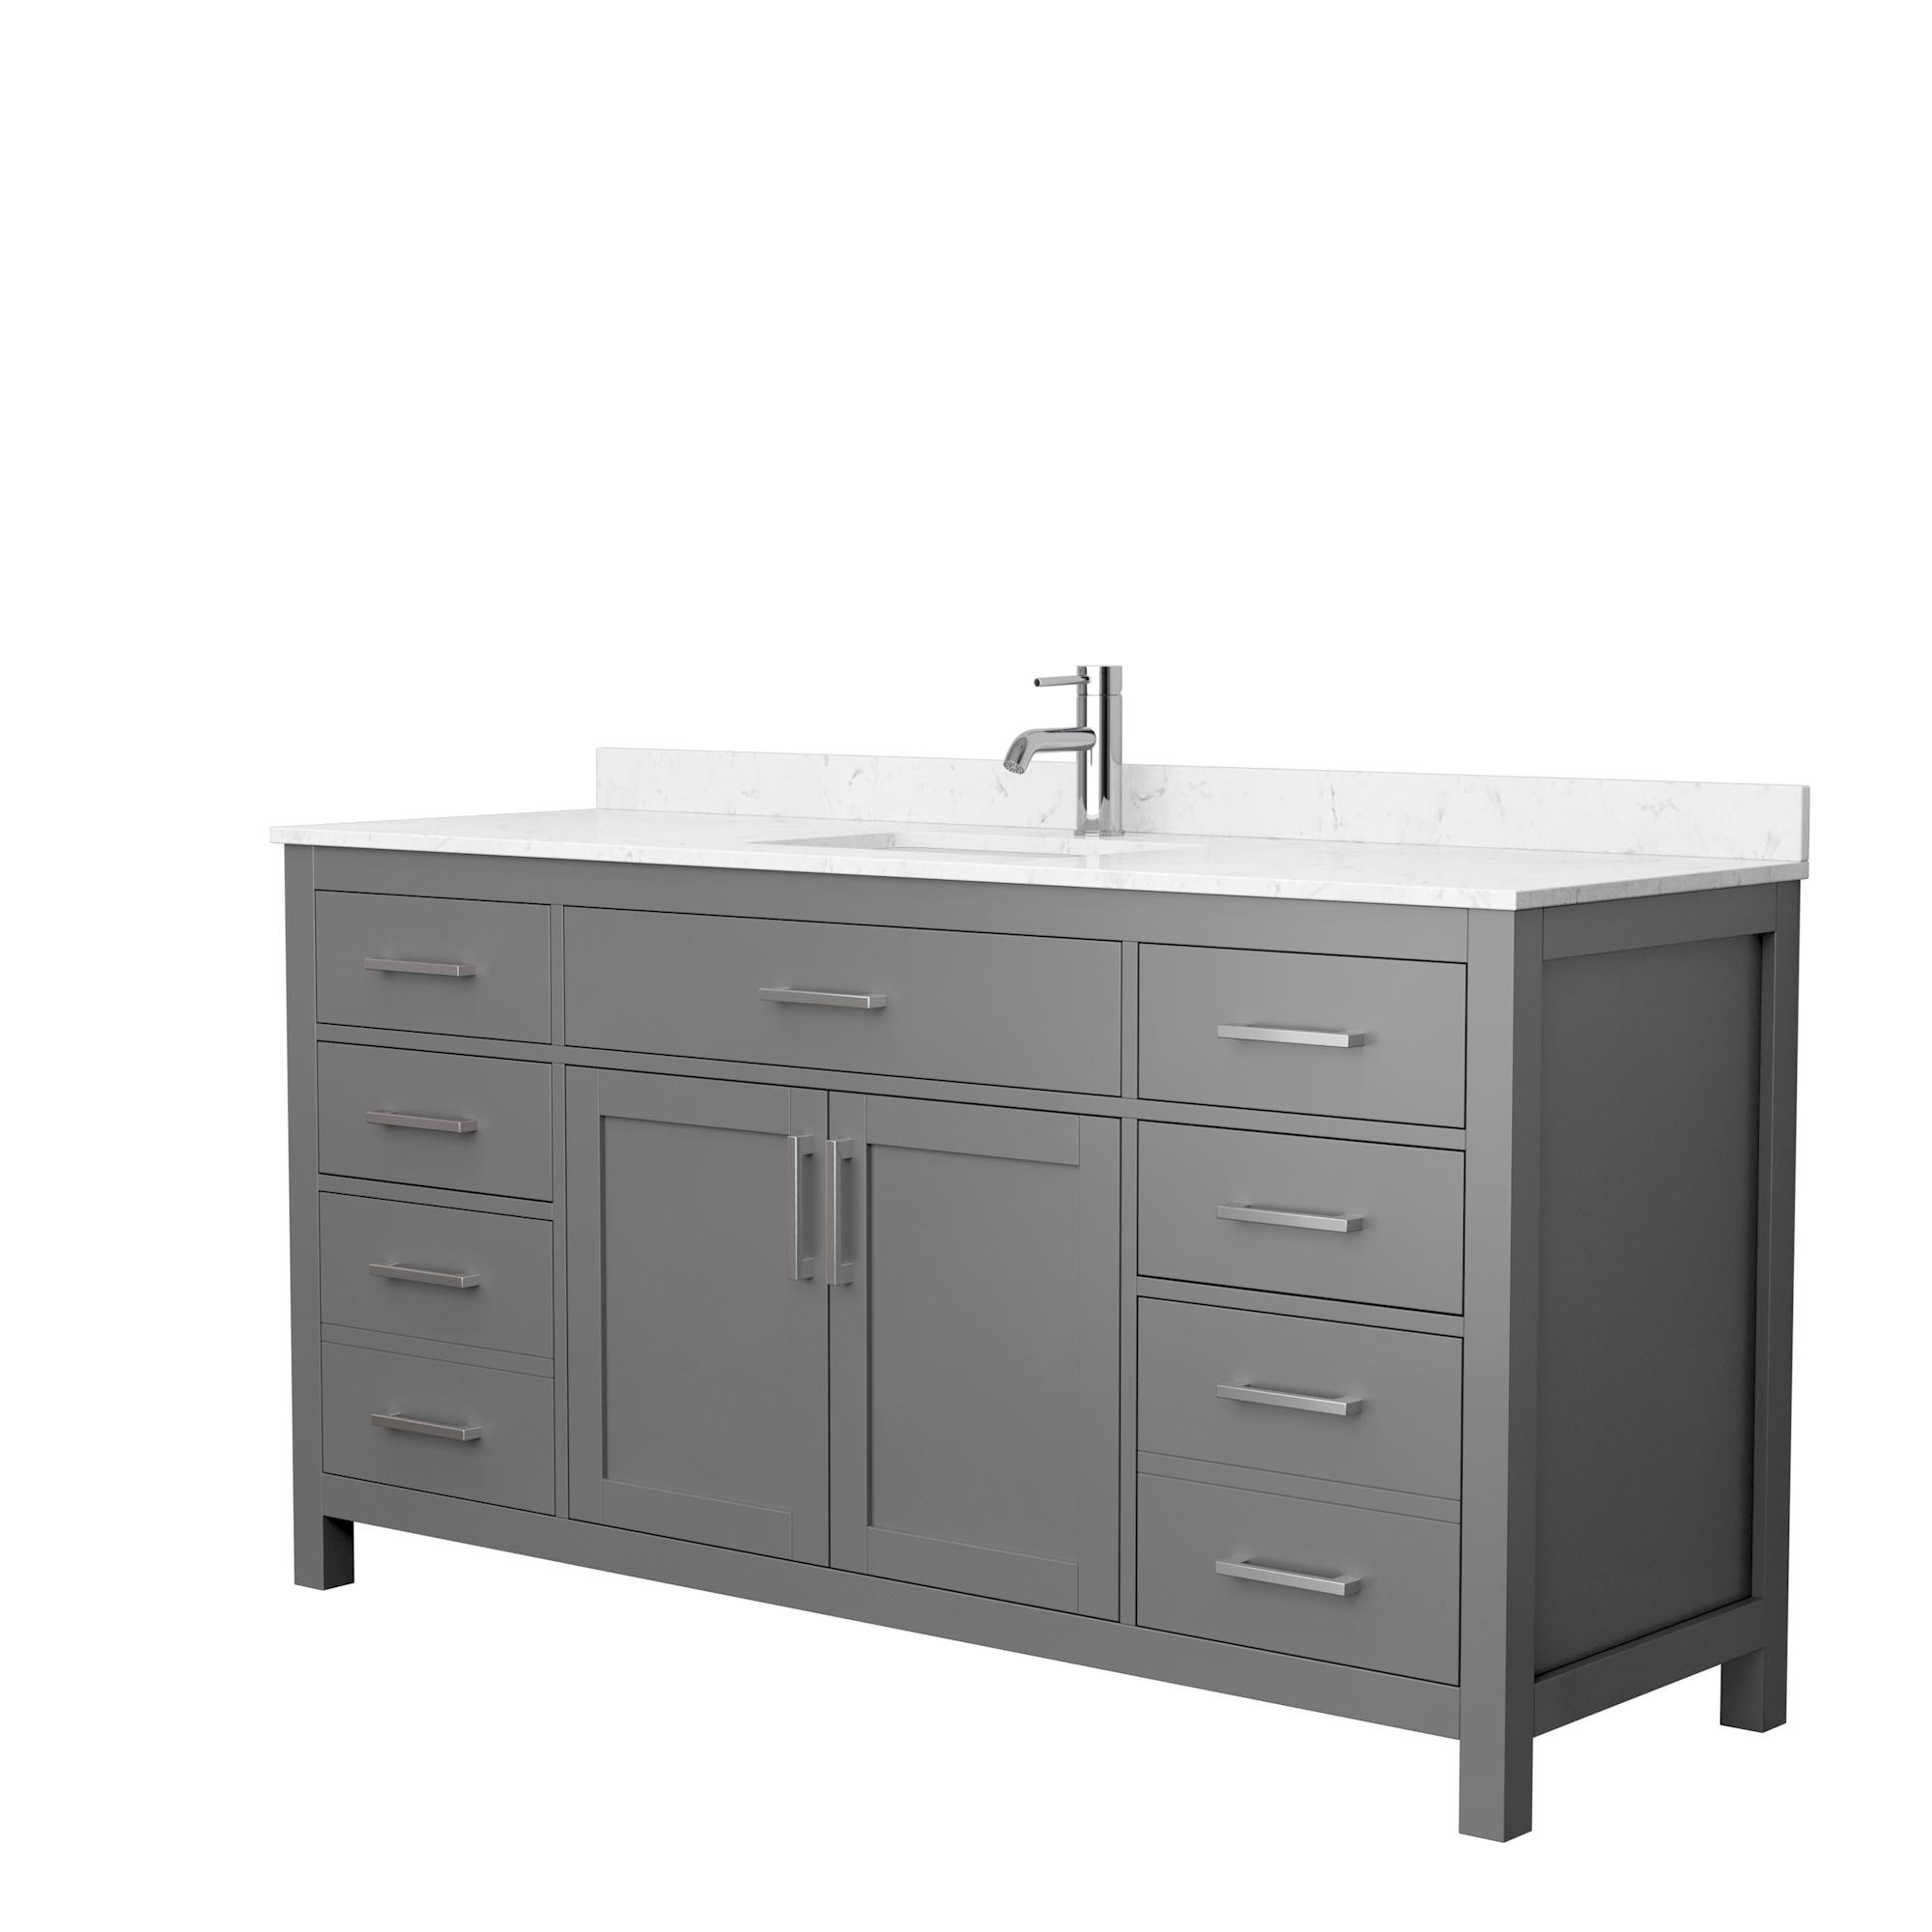 beckett 66 single bathroom vanity by wyndham collection dark gray